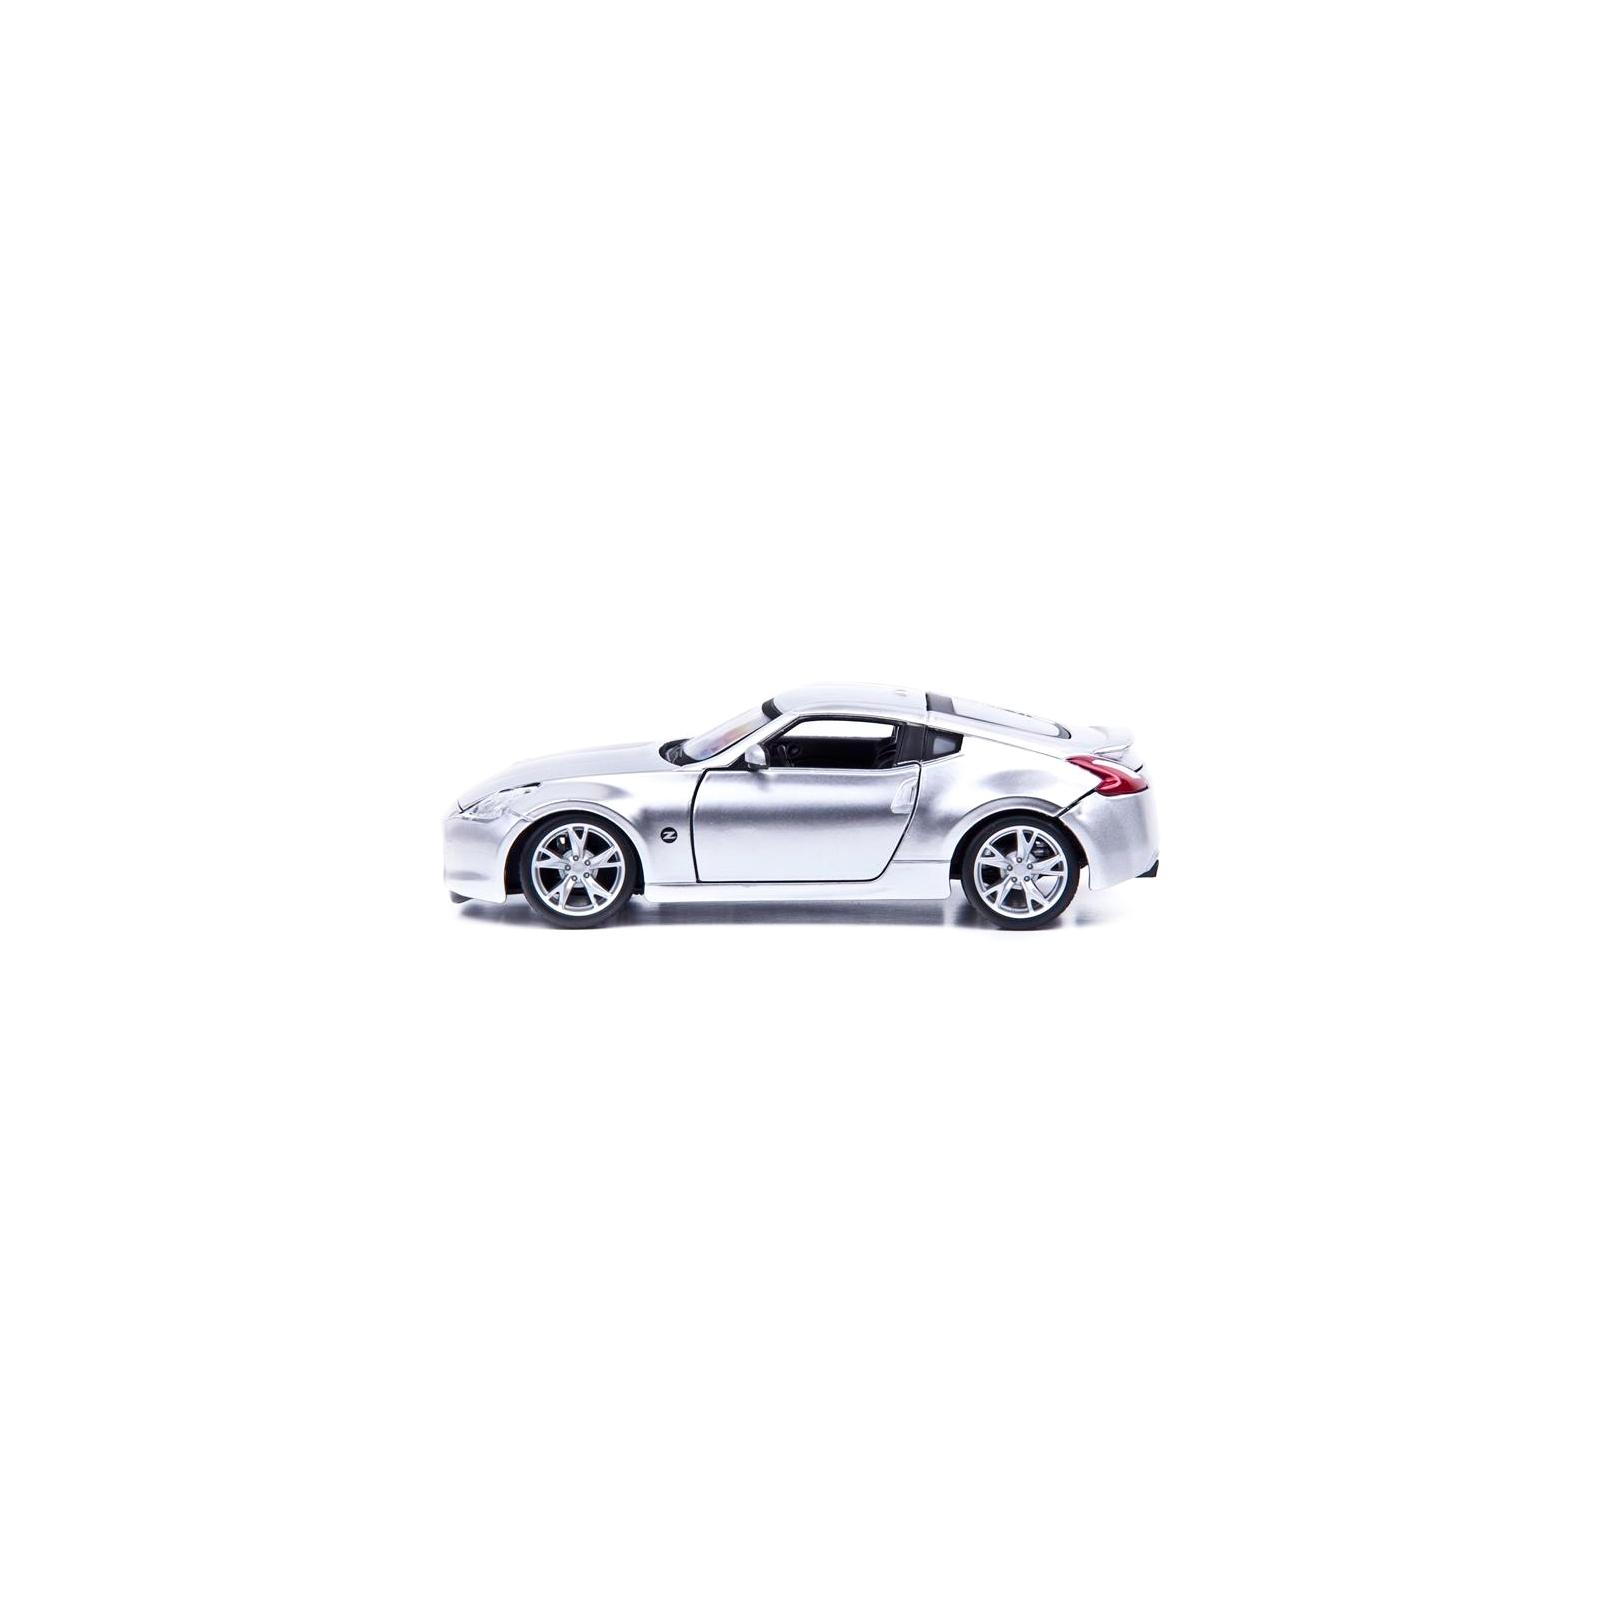 Машина Maisto Nissan 370Z 2009 (1:24) серебристый (31200 silver) изображение 3